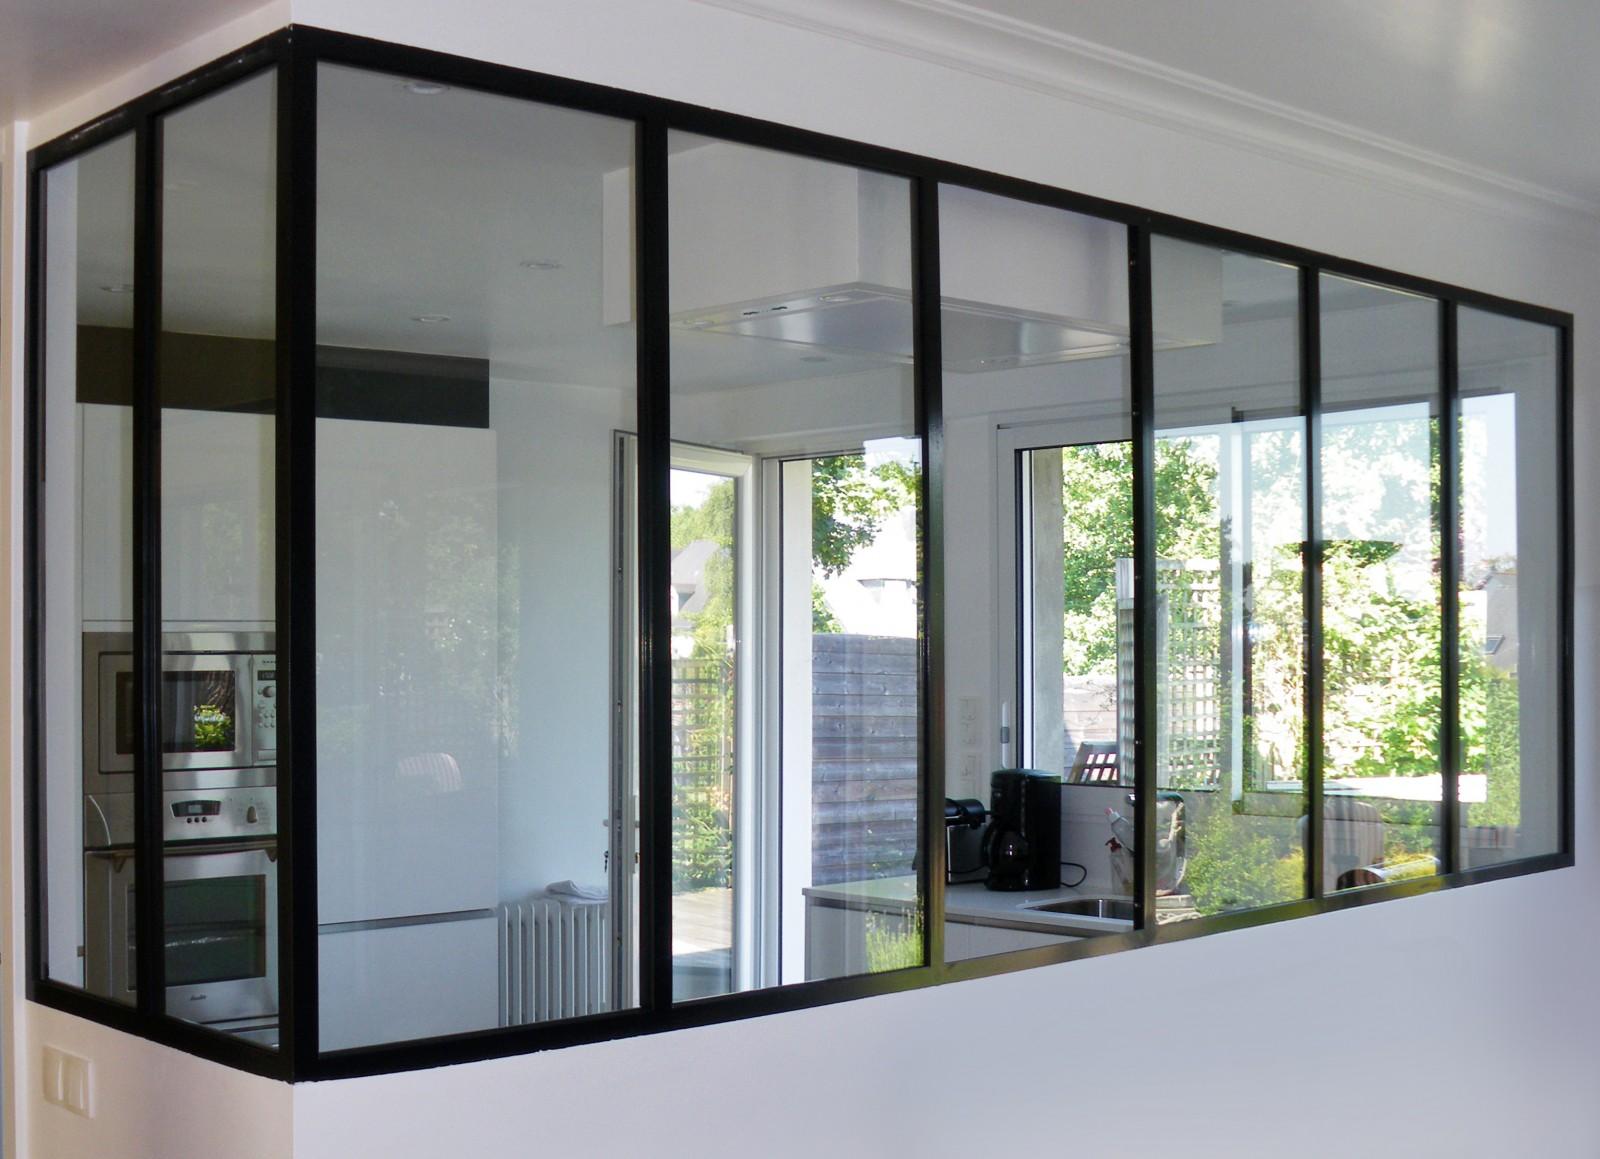 vitre verriere beautiful stunning sparation vitre cuisine gallery formidable separation vitree. Black Bedroom Furniture Sets. Home Design Ideas